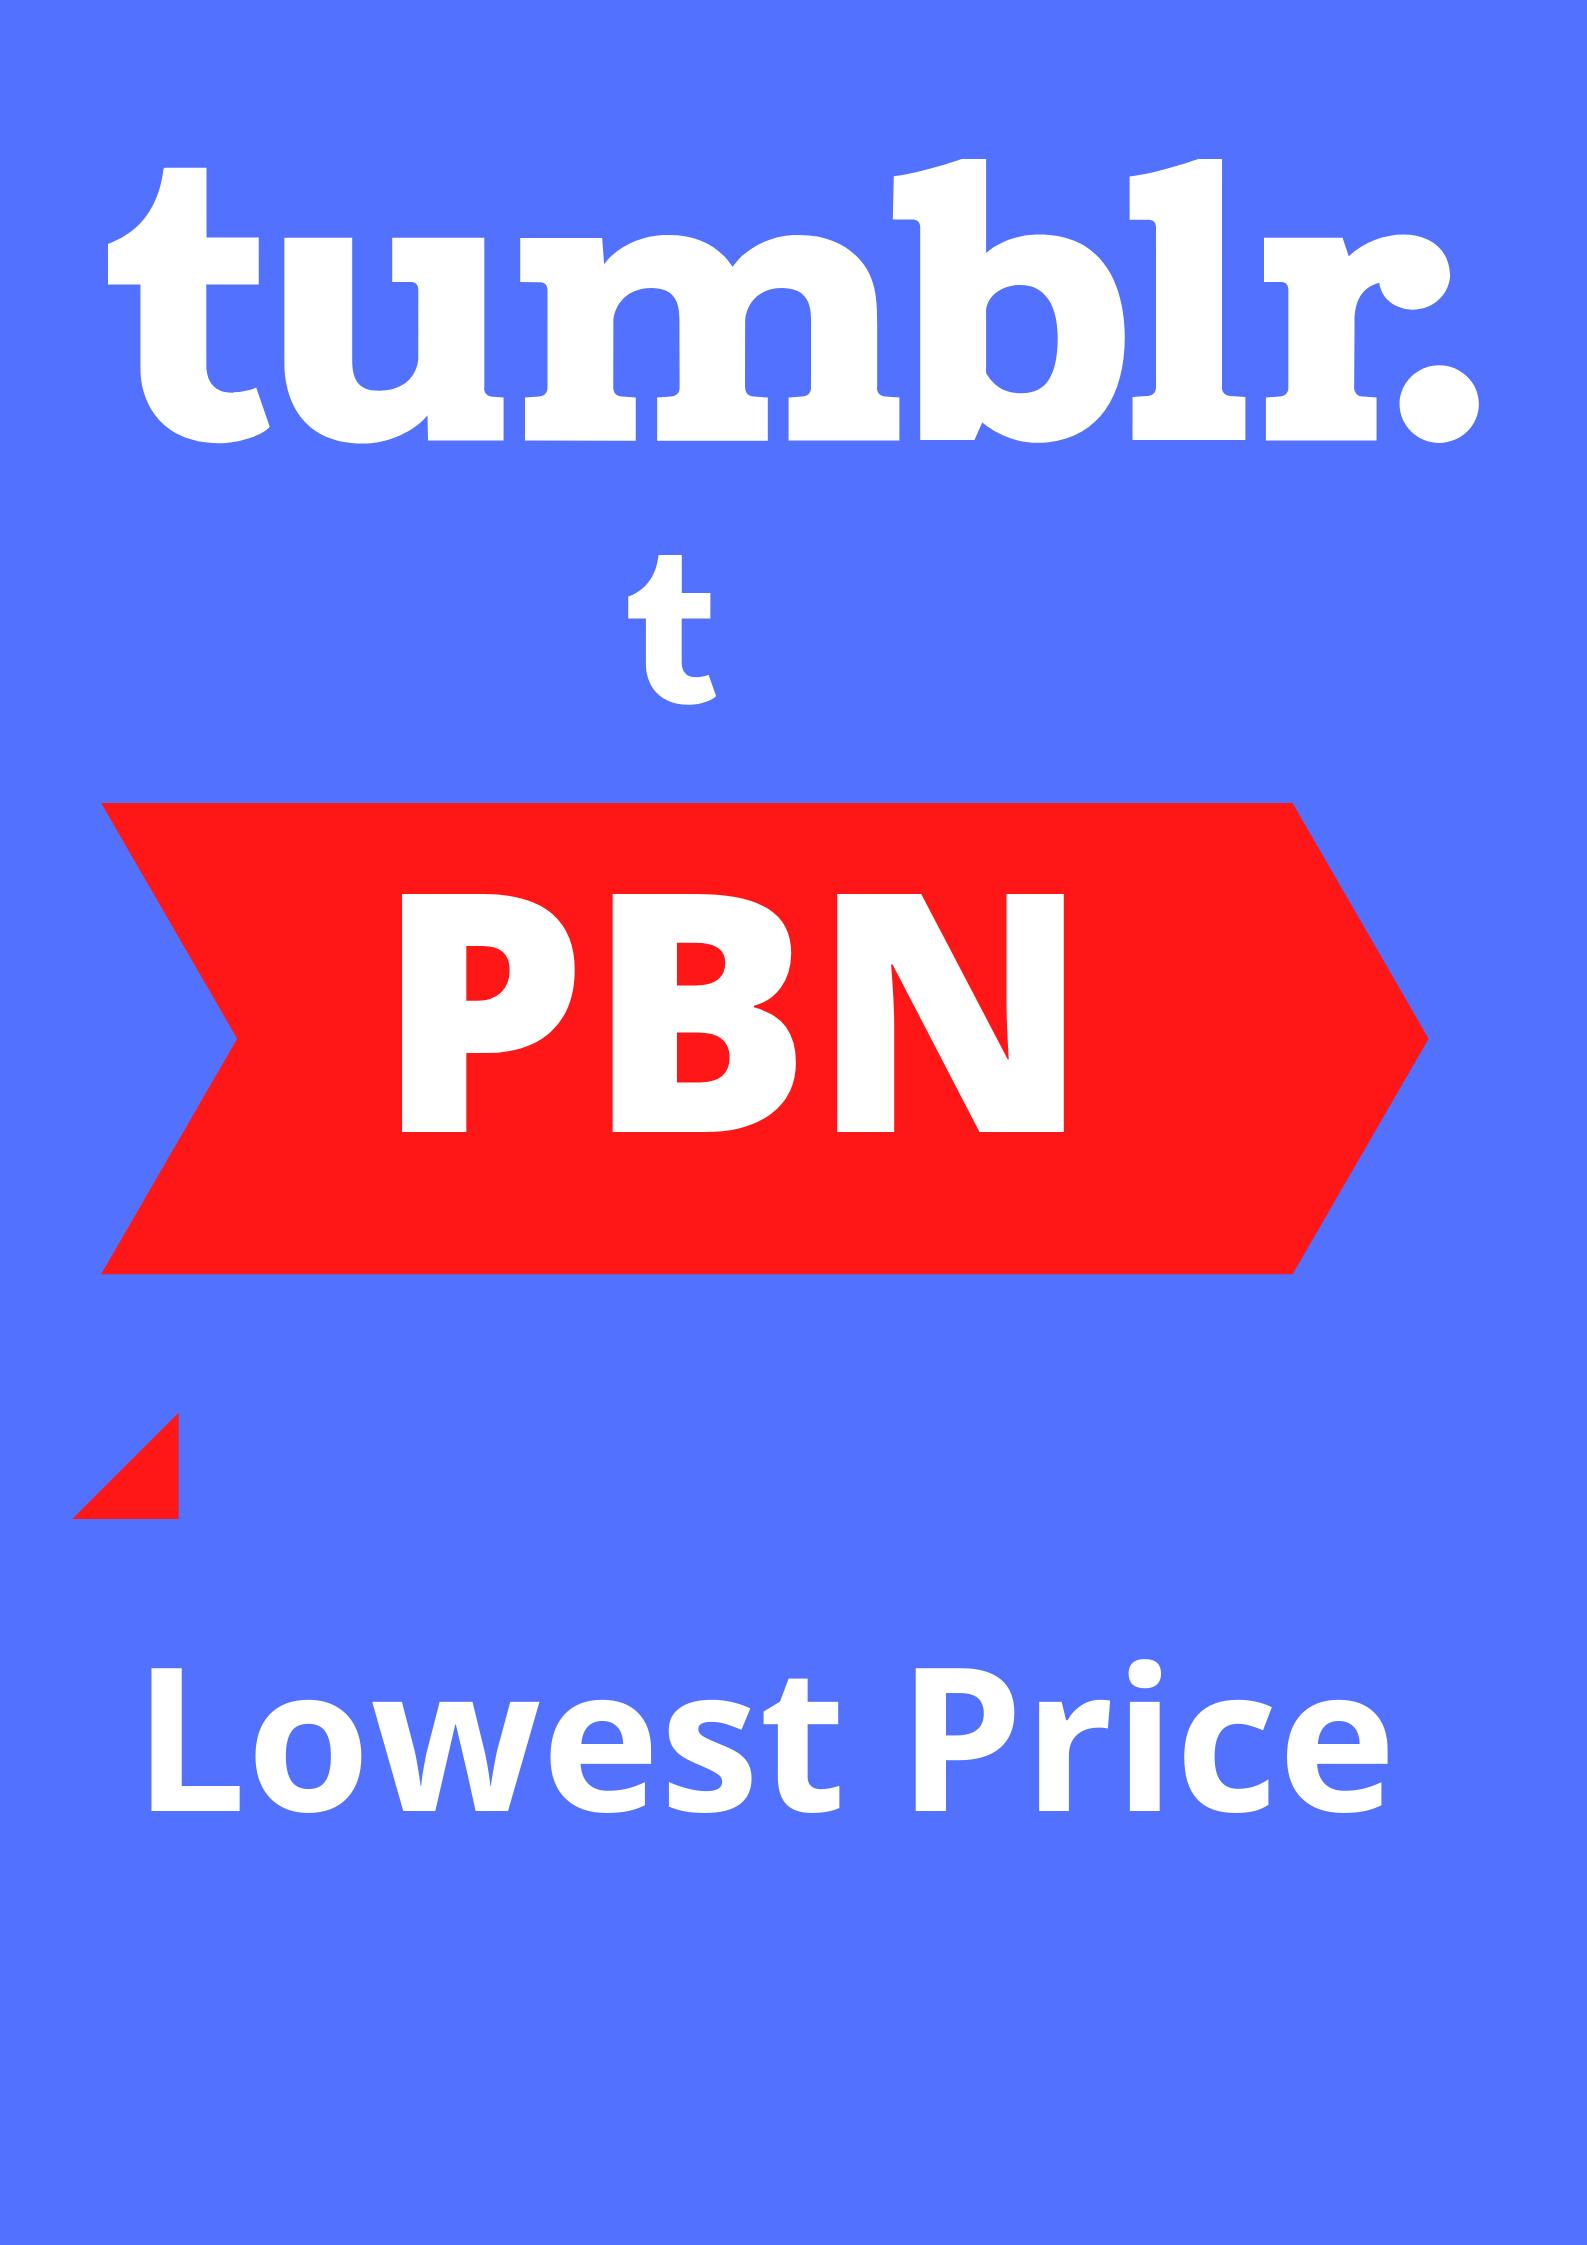 10 Tumblr DoFollow PBN Backlinks 100 Manual not Redirect